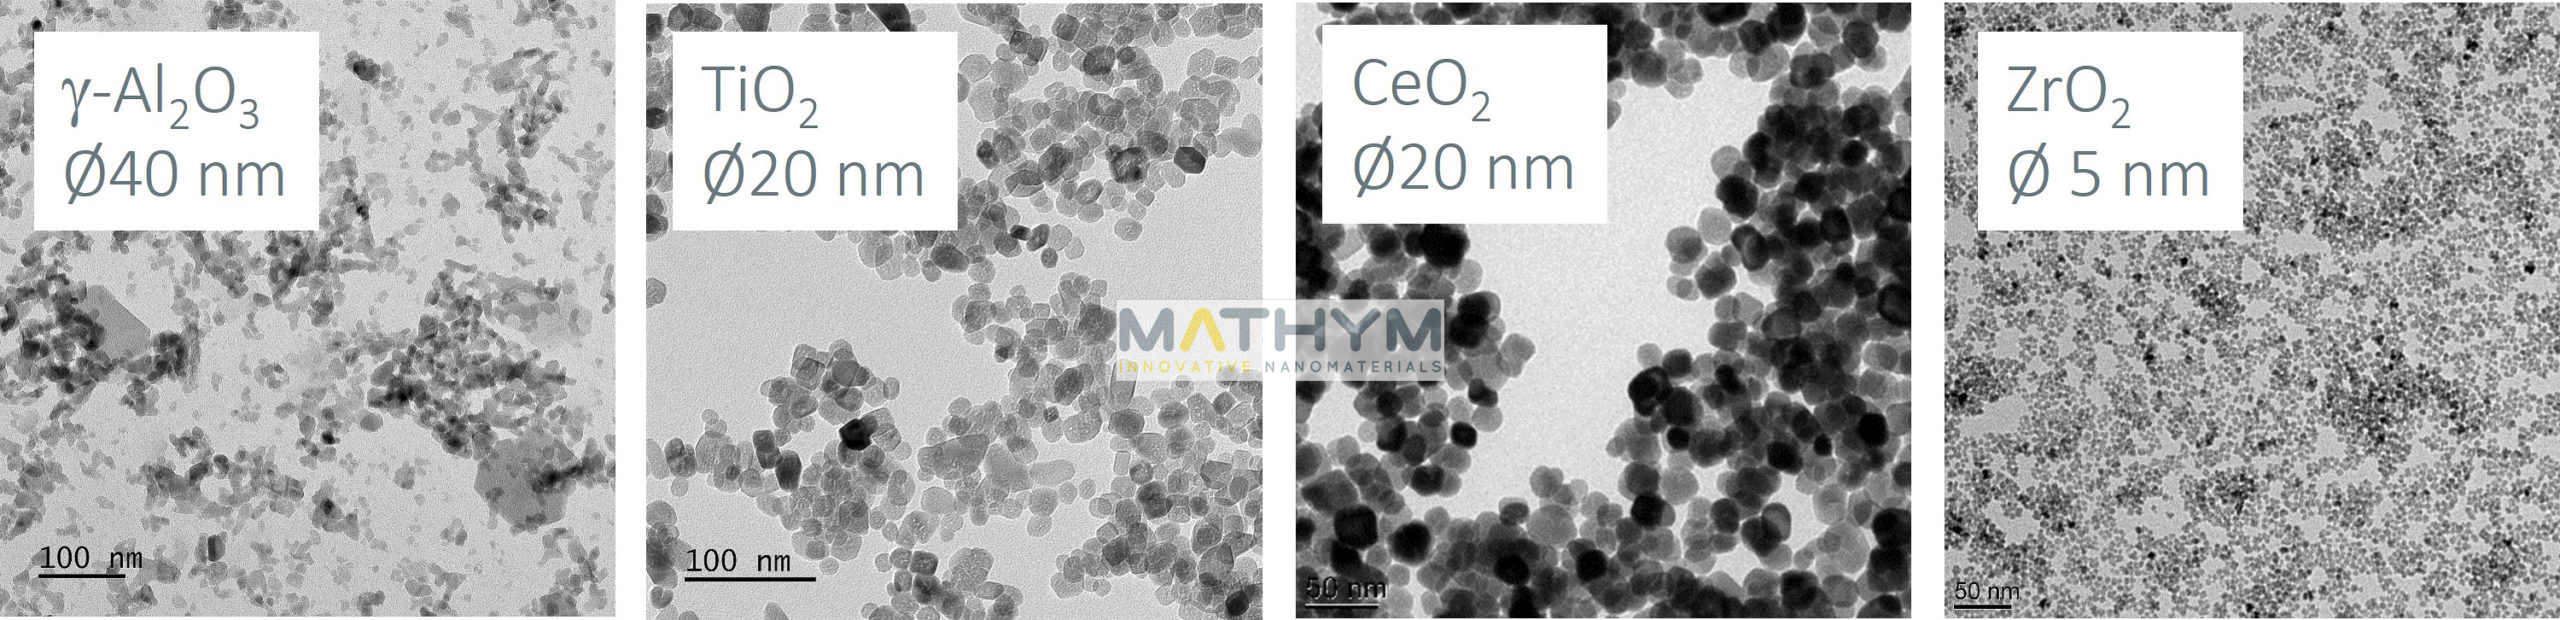 Mathym Nanoparticles dispersed Al2O3, TiO2, CeO2, ZrO2